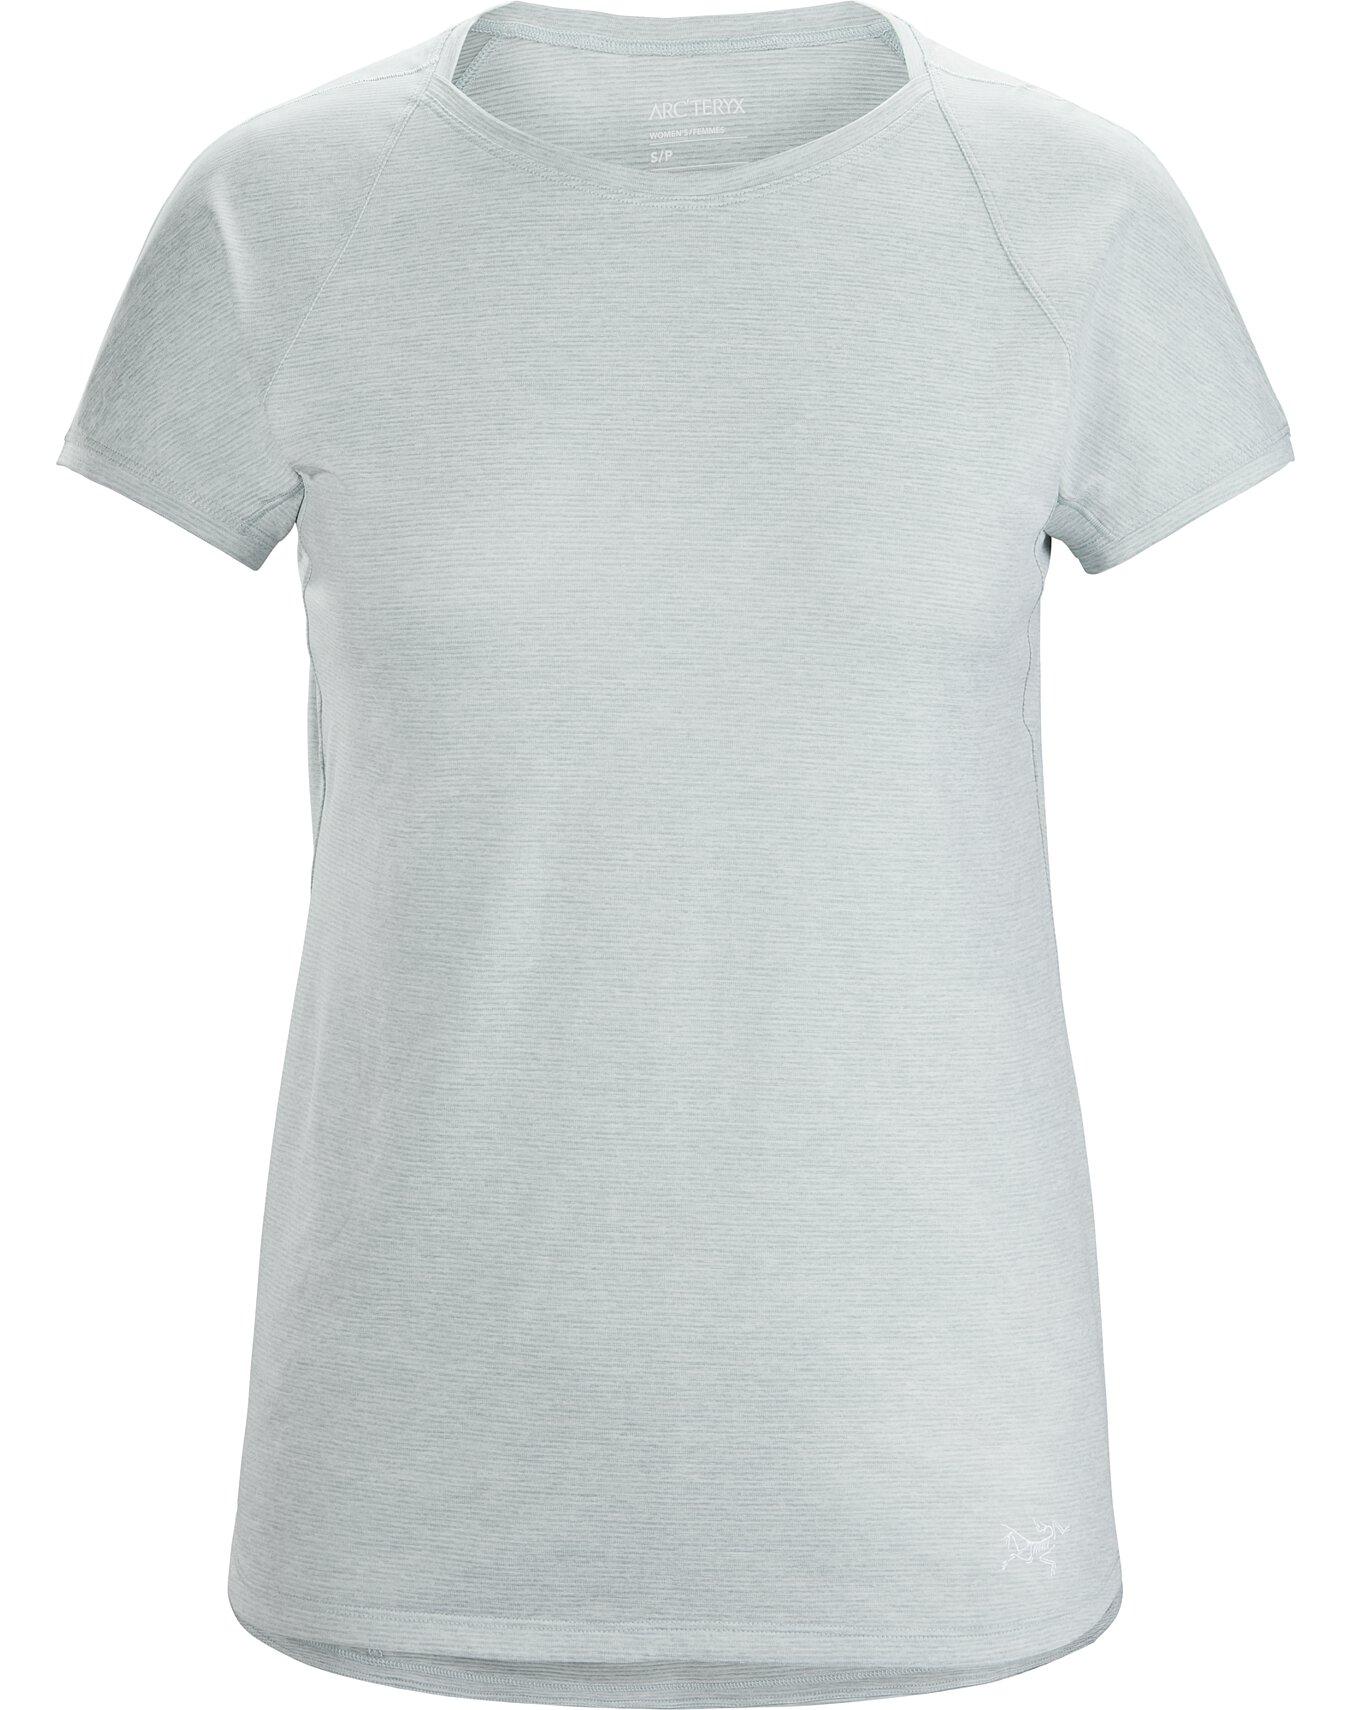 Taema Crew Neck Shirt SS Women's